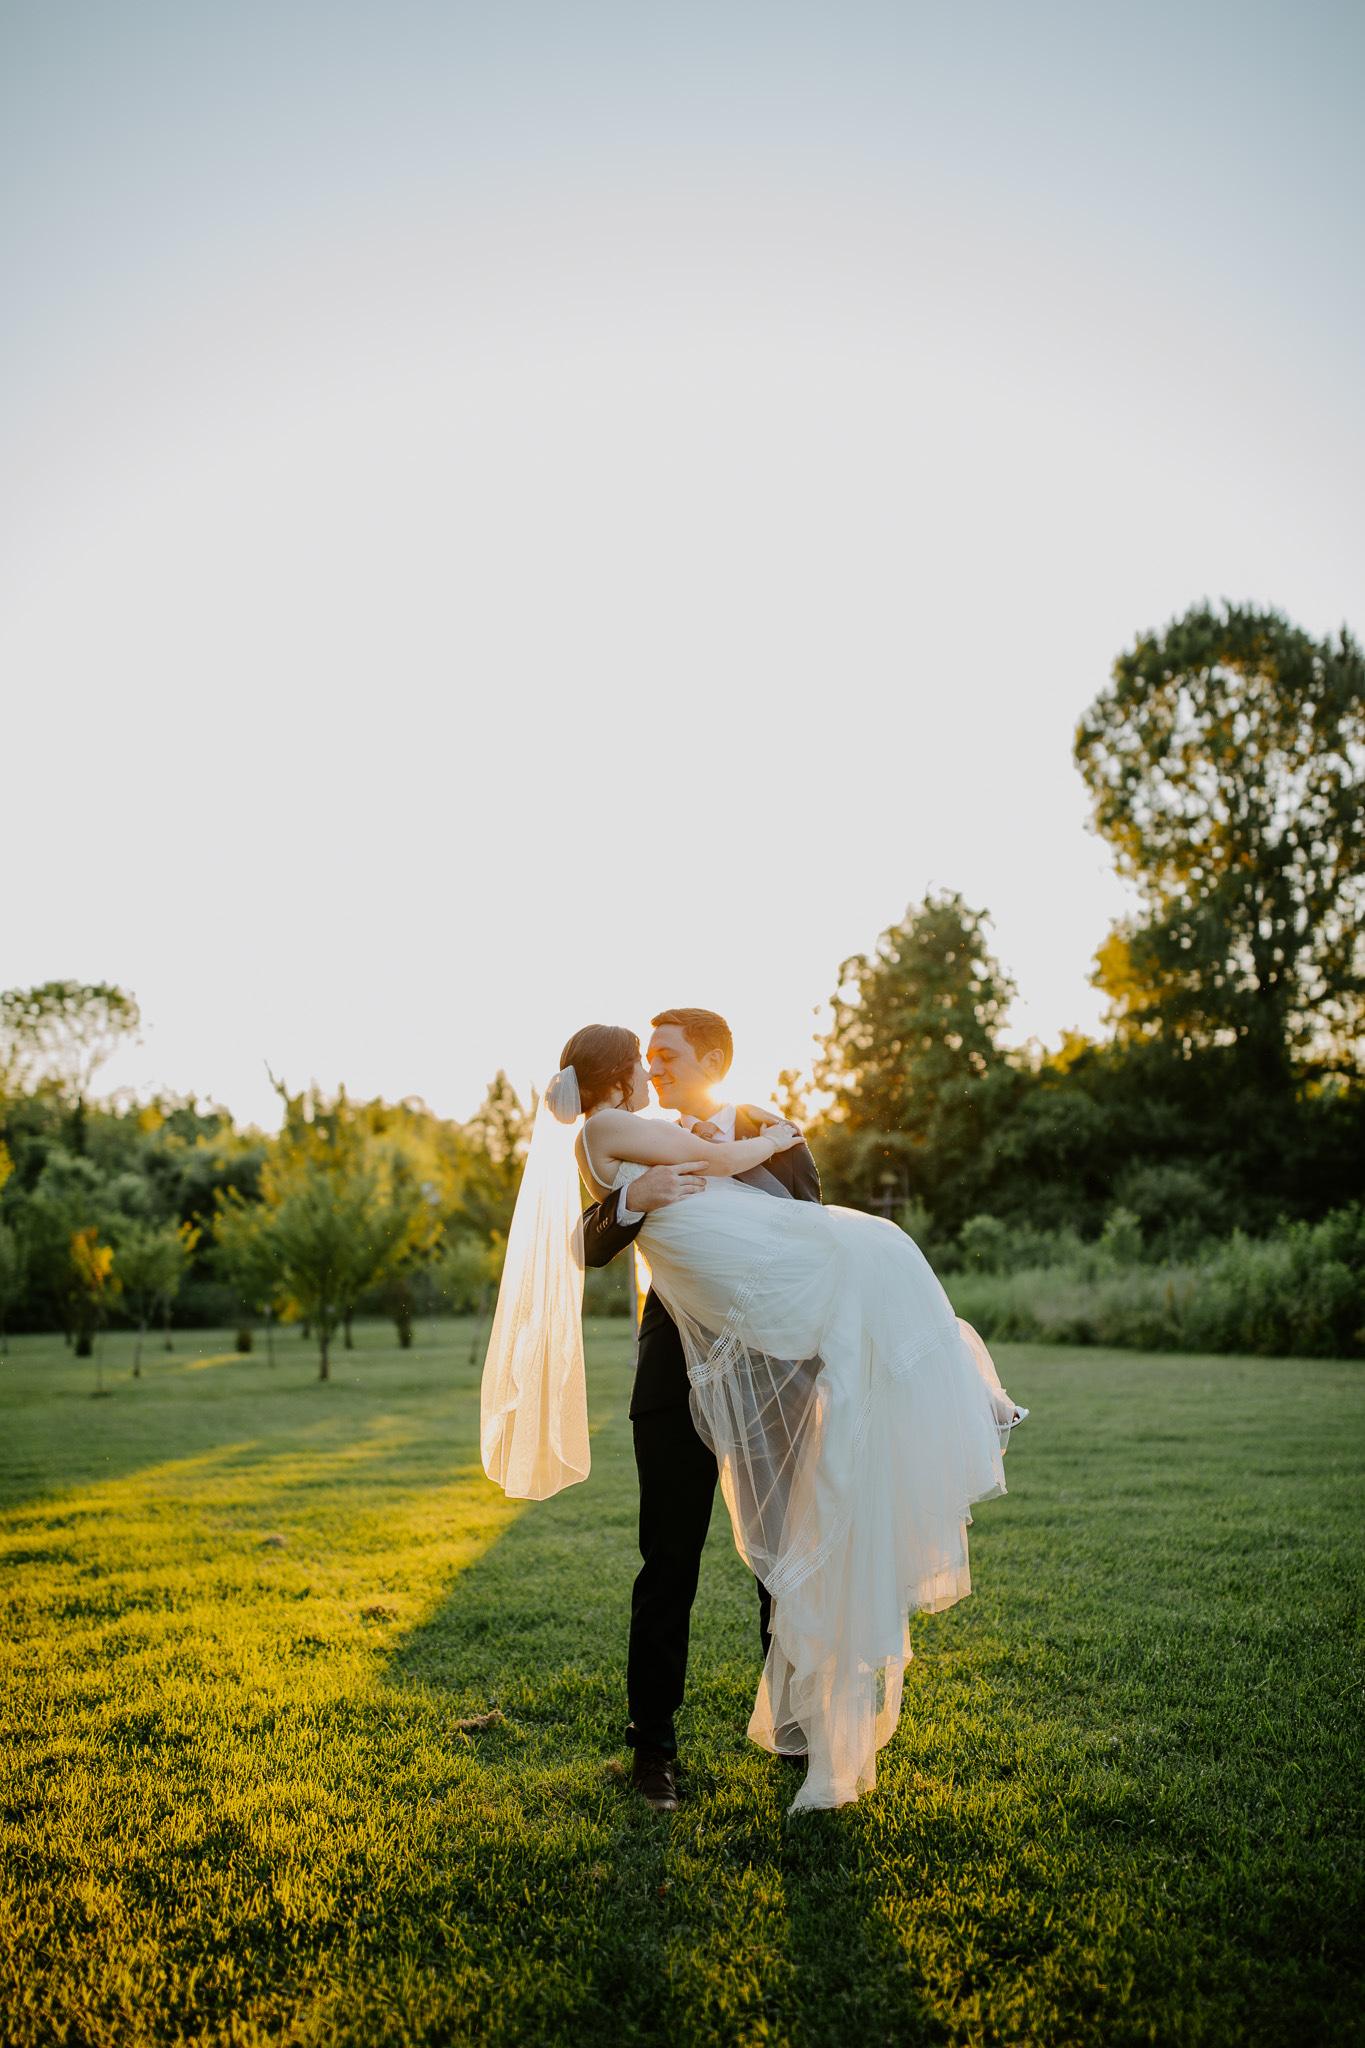 Golden hour wedding photos: Vibrant Summer Wedding at Sinking Creek Farm featured on Nashville Bride Guide